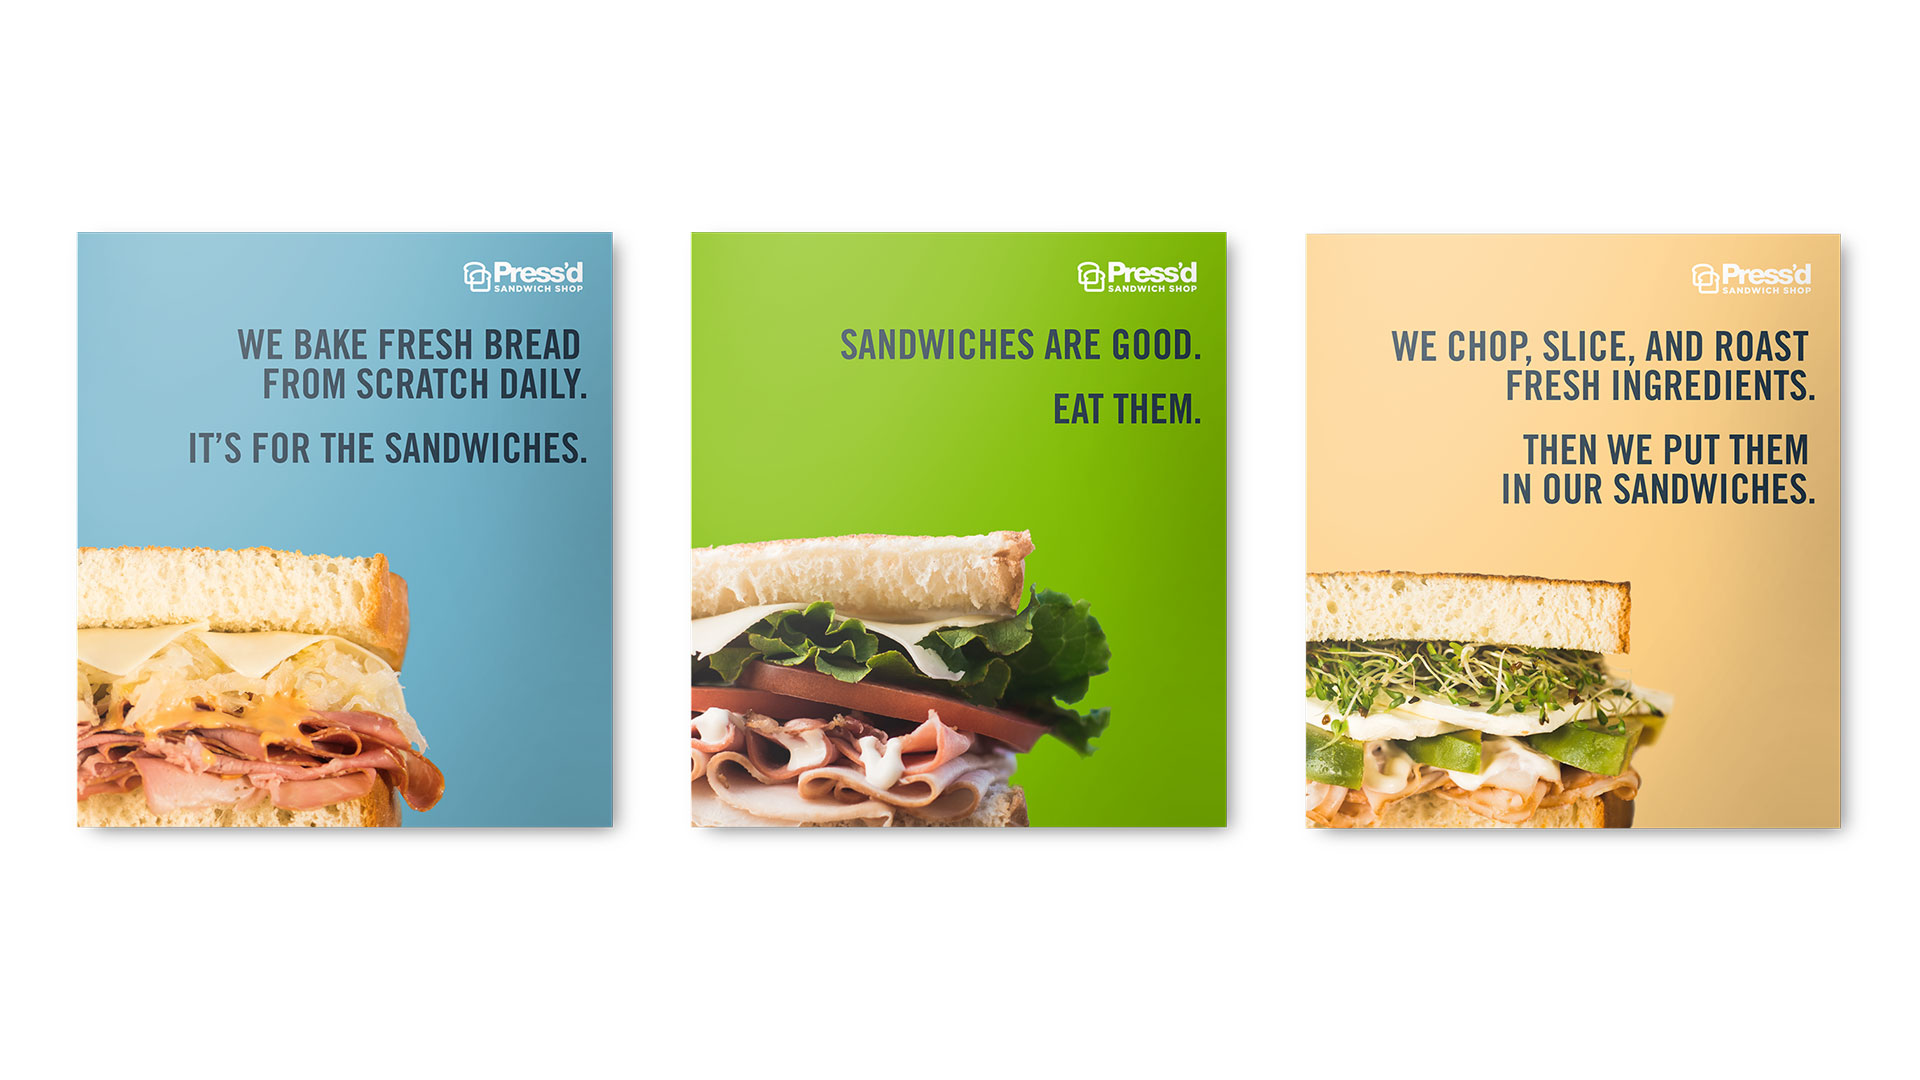 daughtercreative_press'd_sandwichposters.jpg